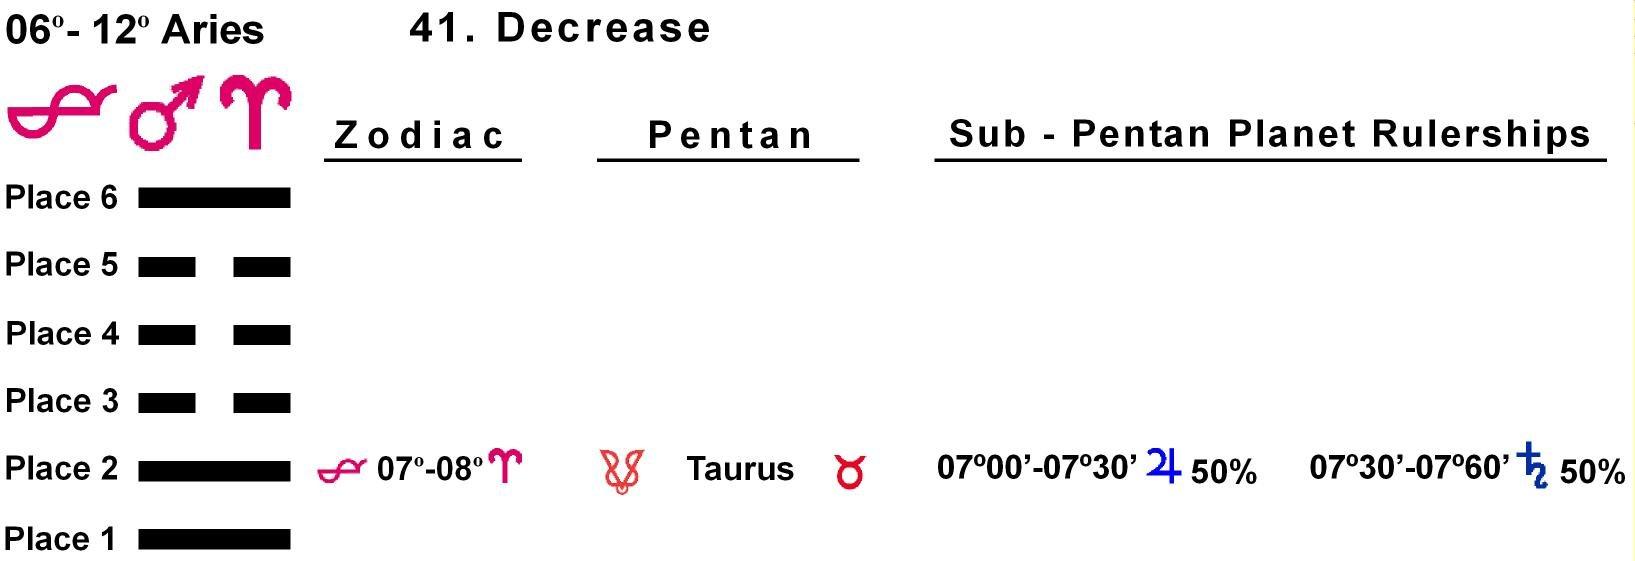 Pent-lines-01AR 07-08 Hx-41 Decrease